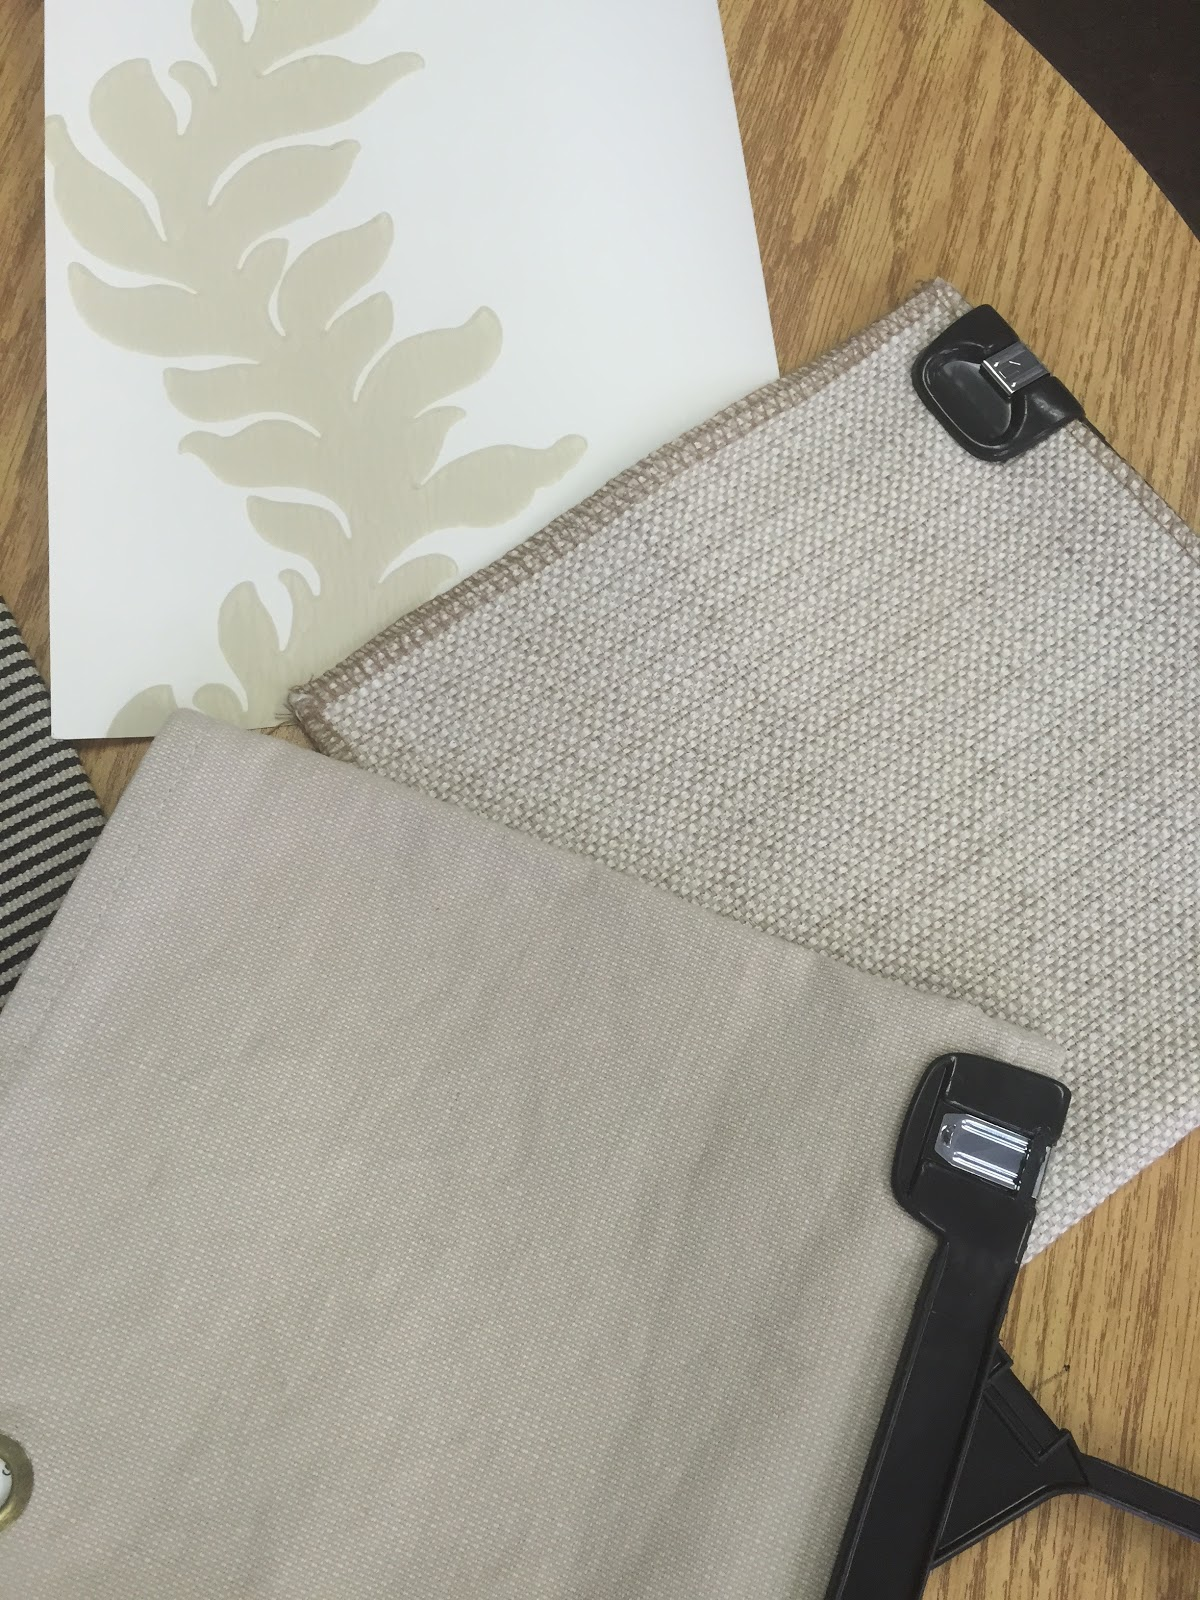 Lee Industries Fabric